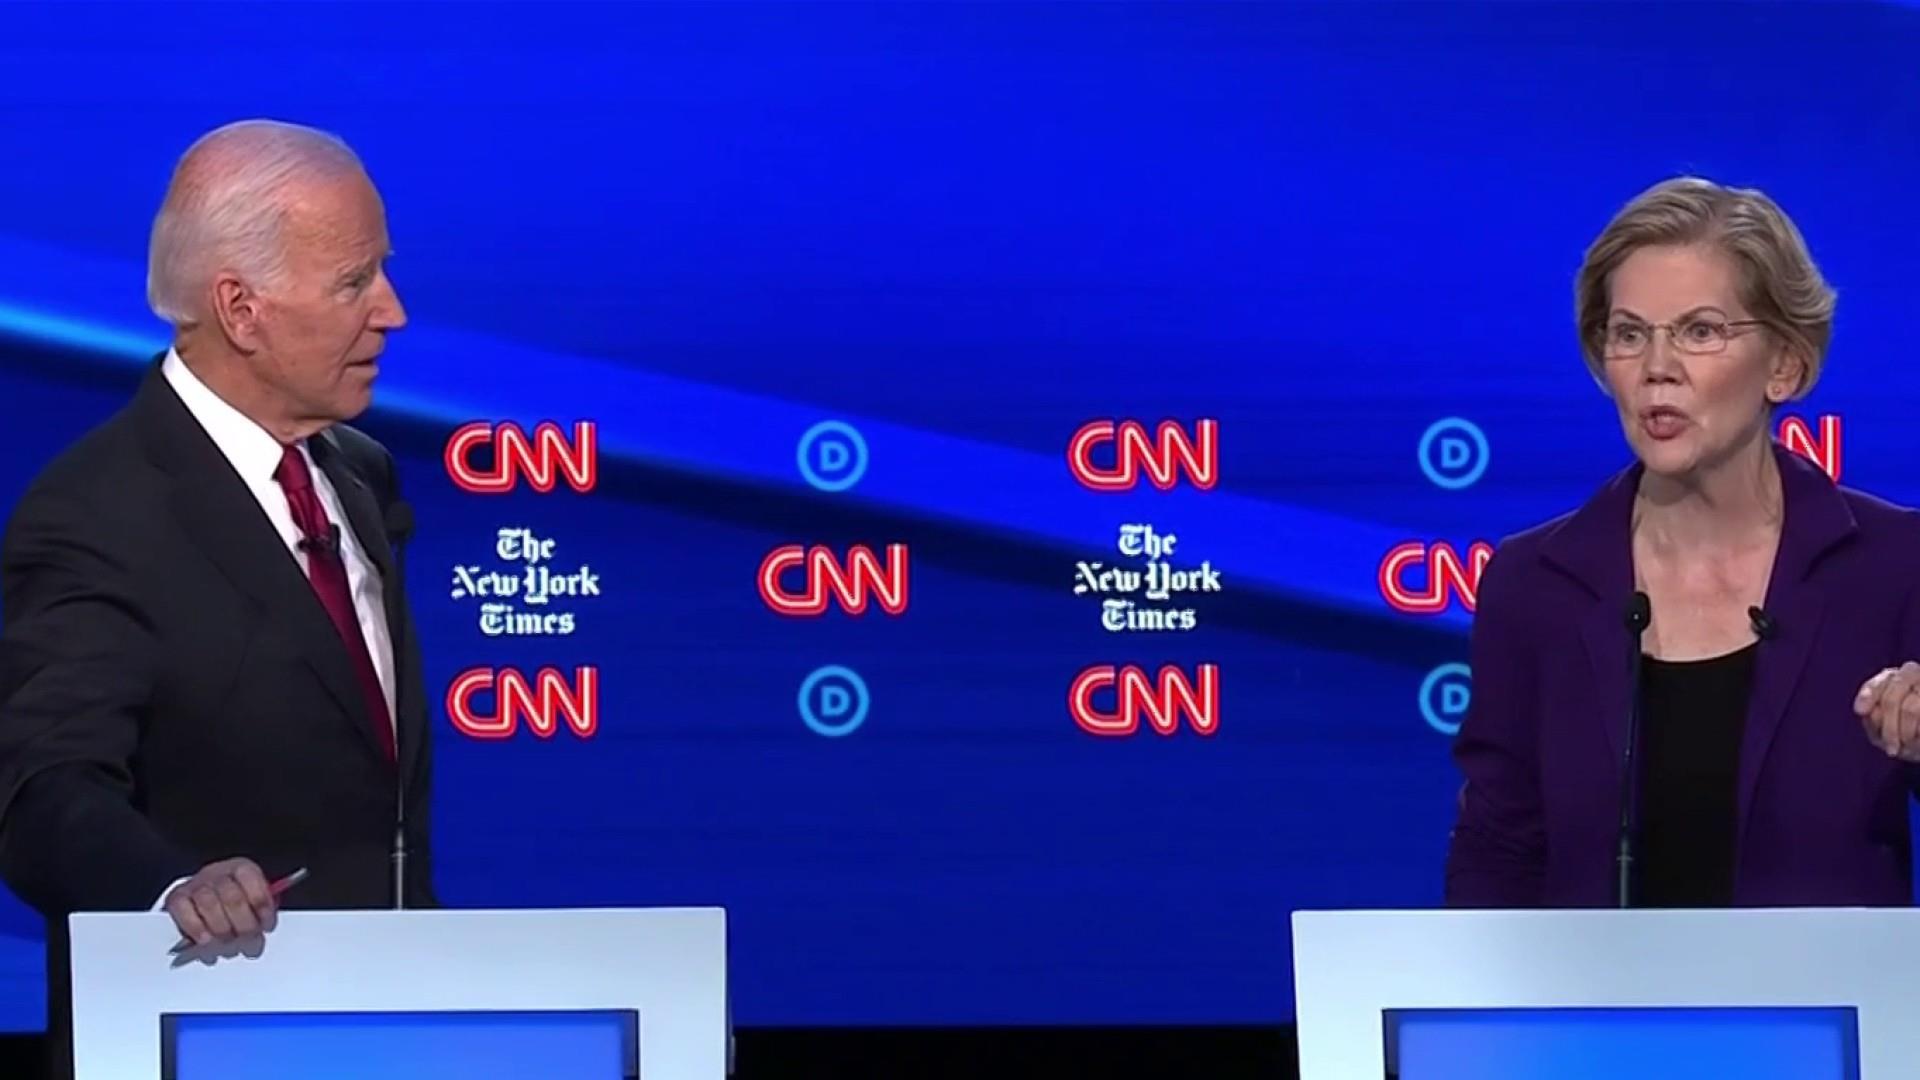 Biden and Warren's relationship shows strain during debate